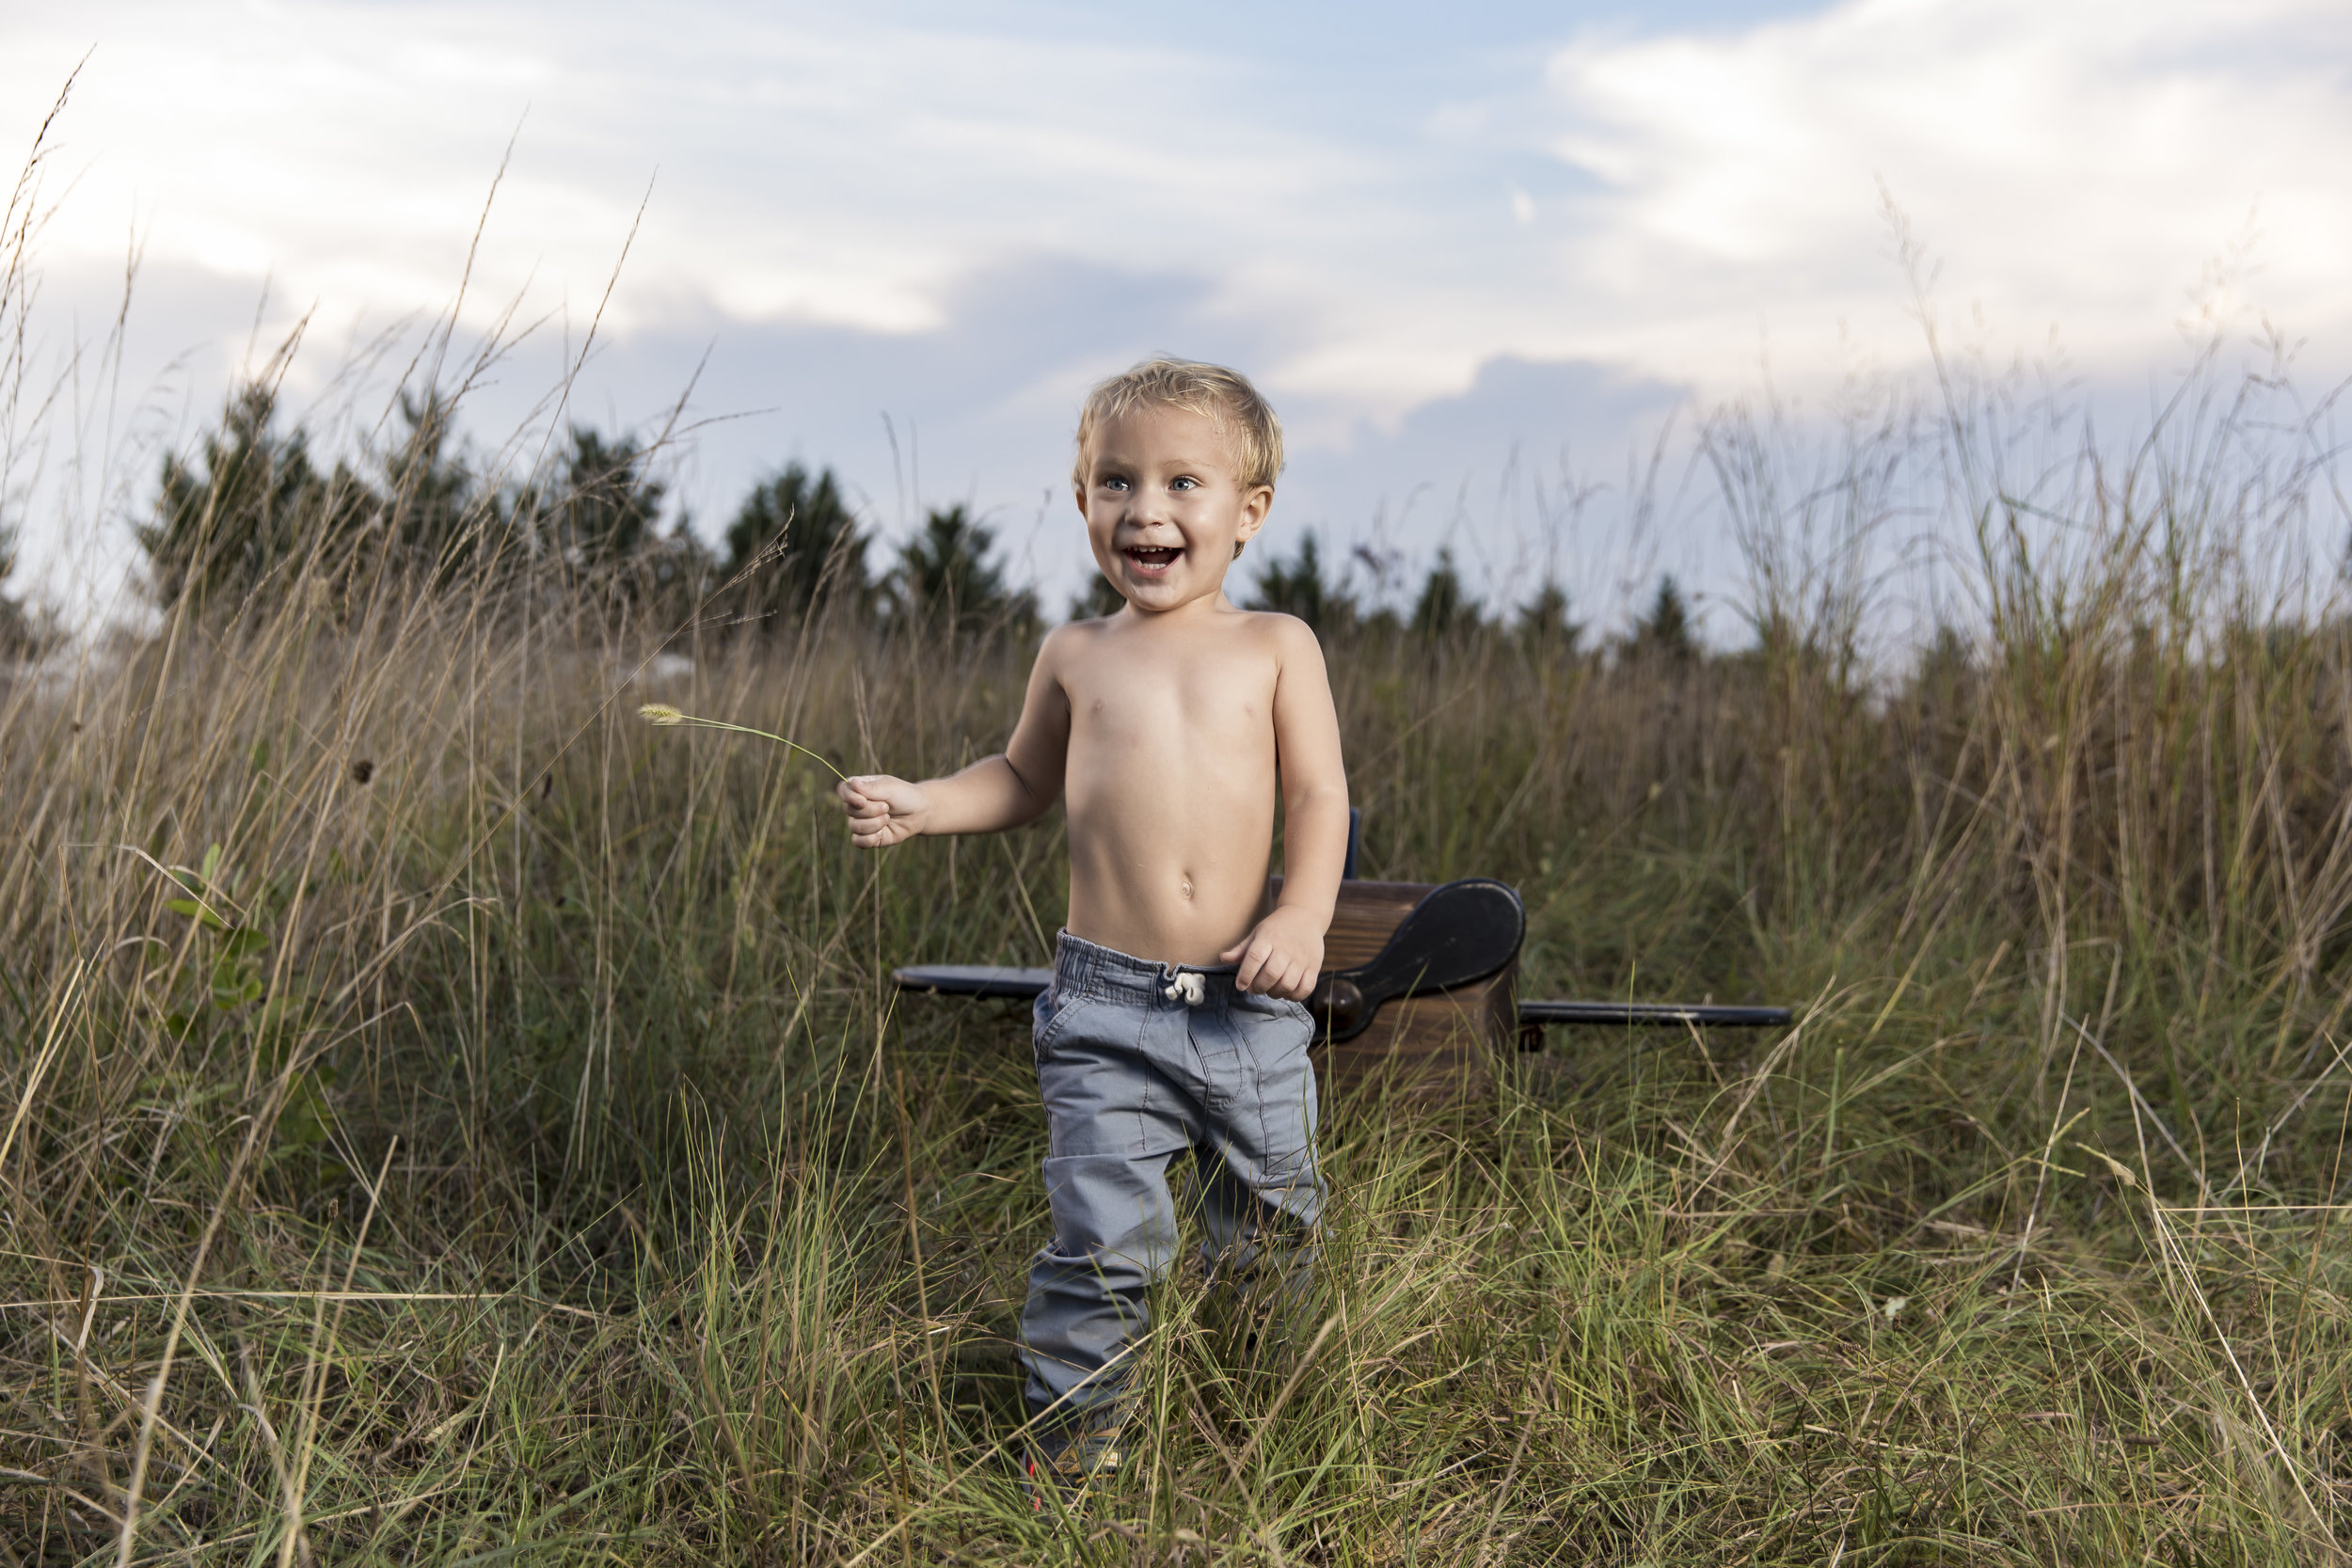 Toddler in grassy field